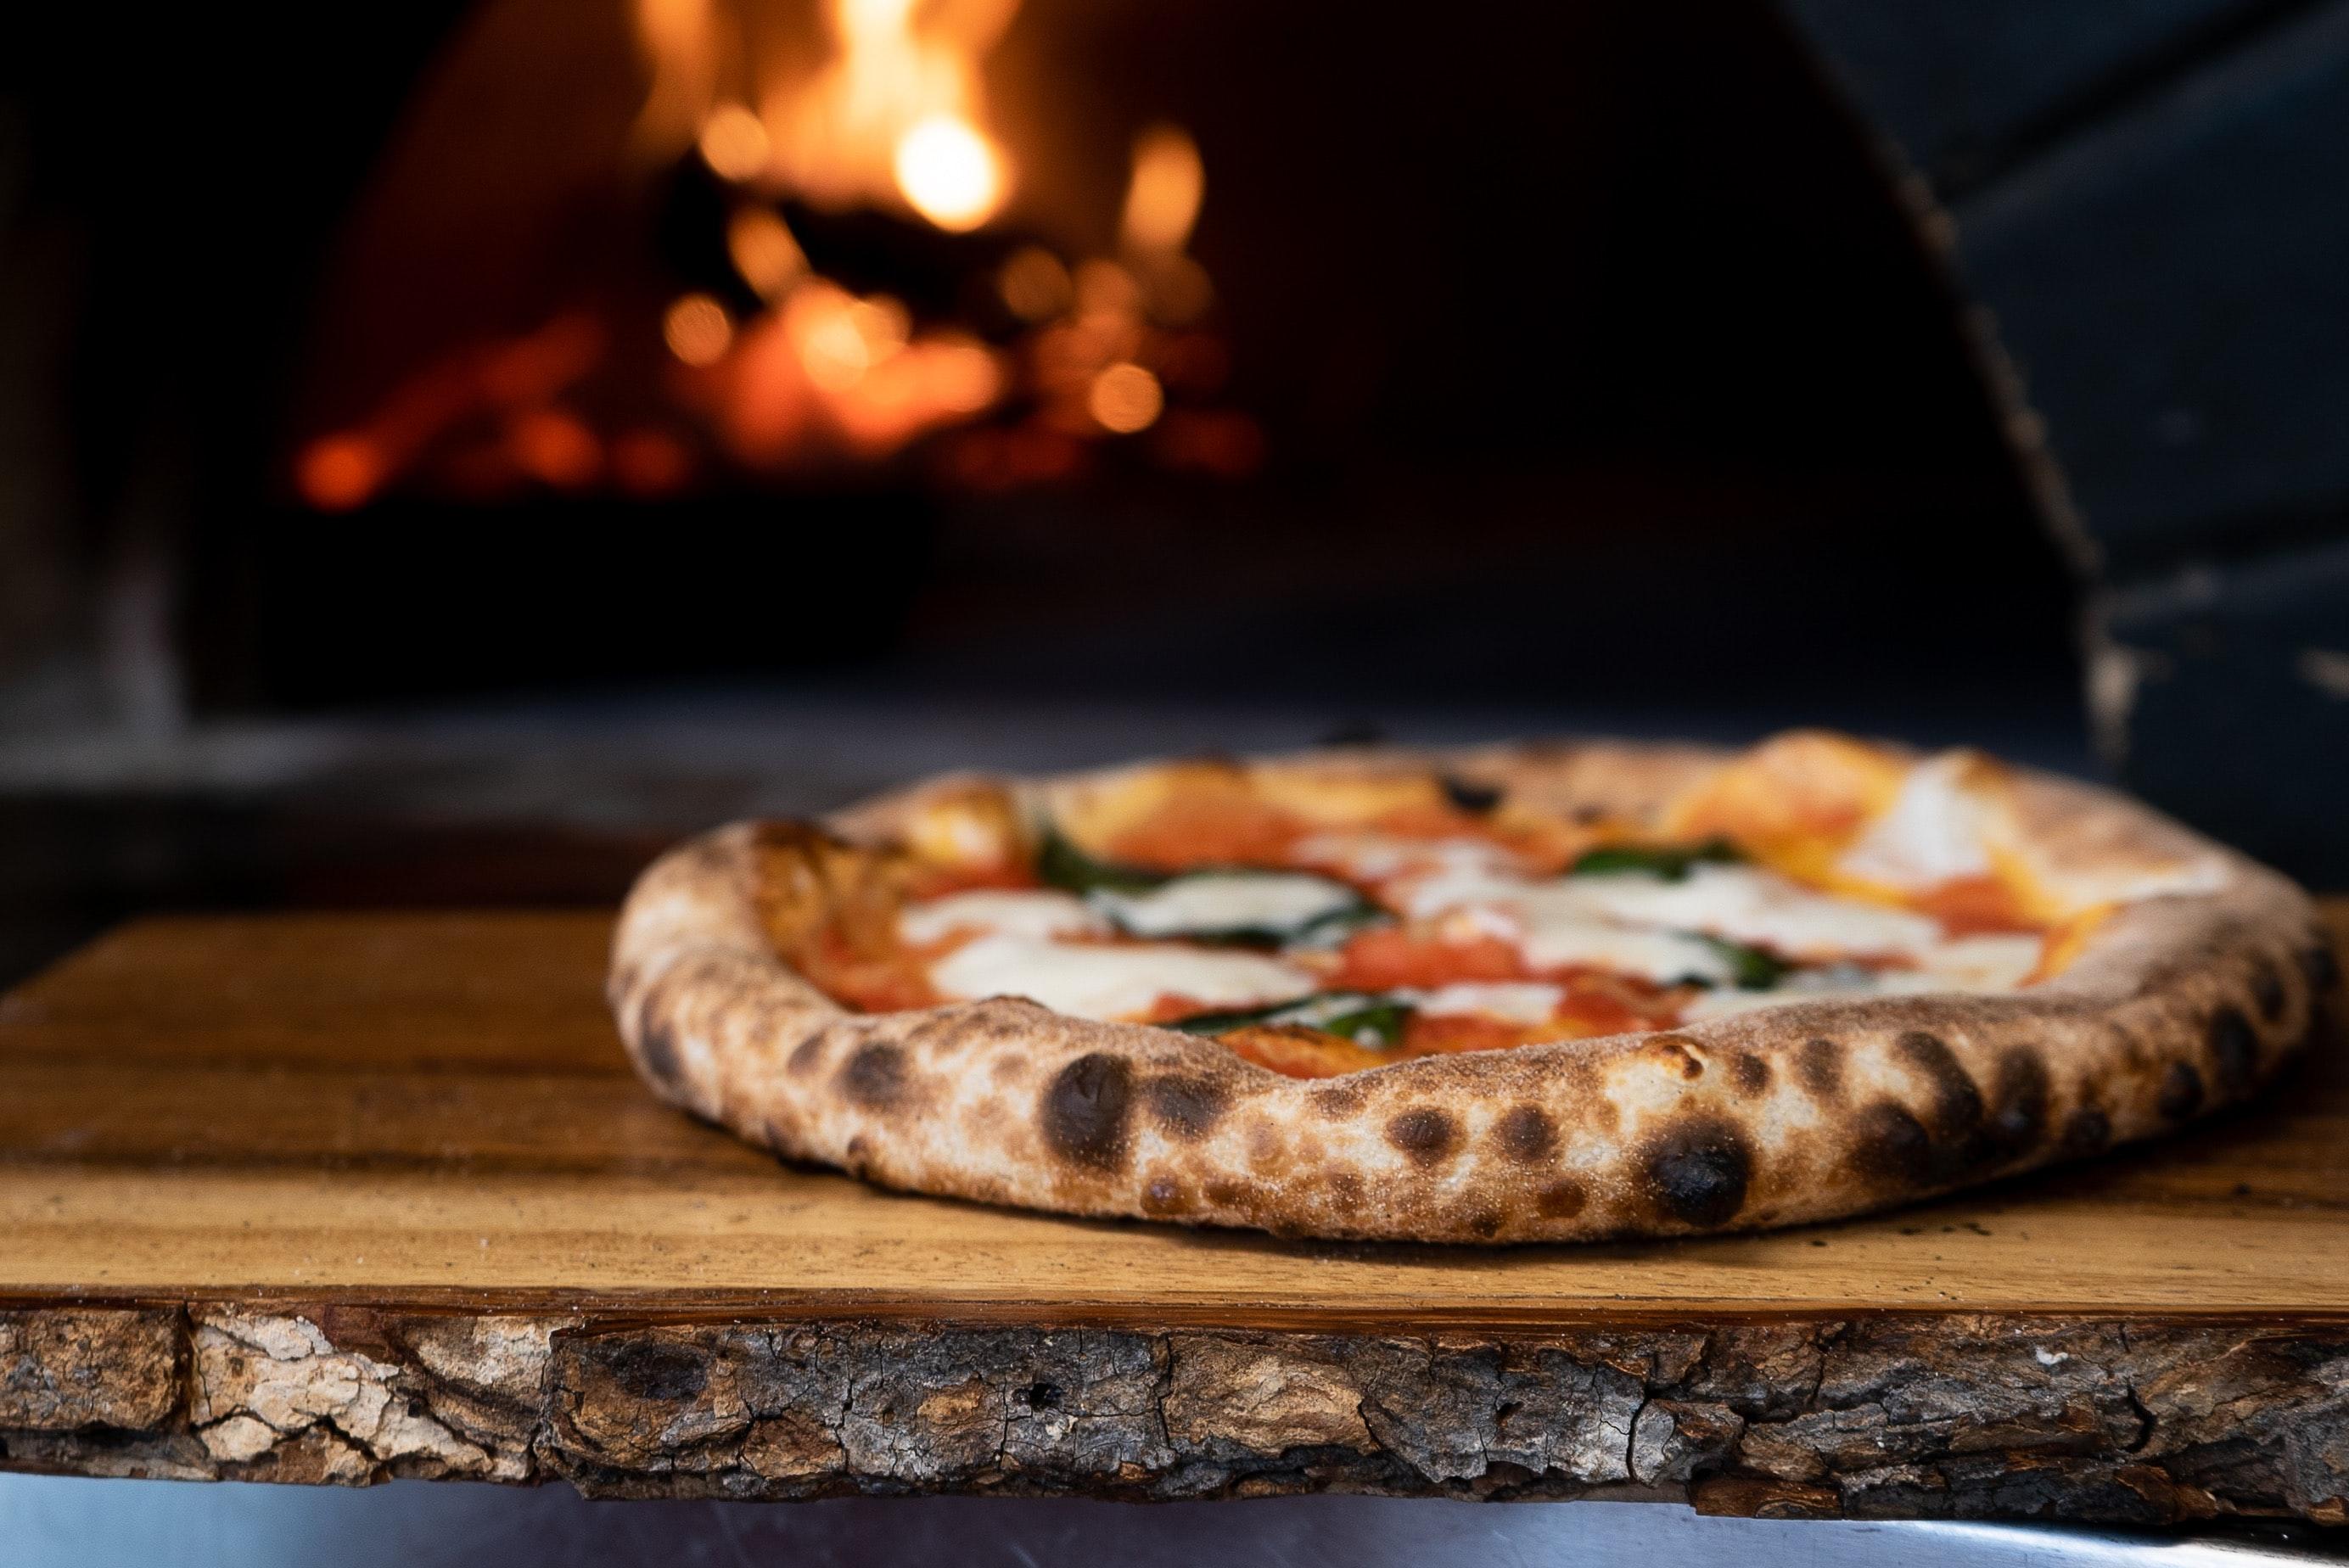 Recipes for homemade pizza